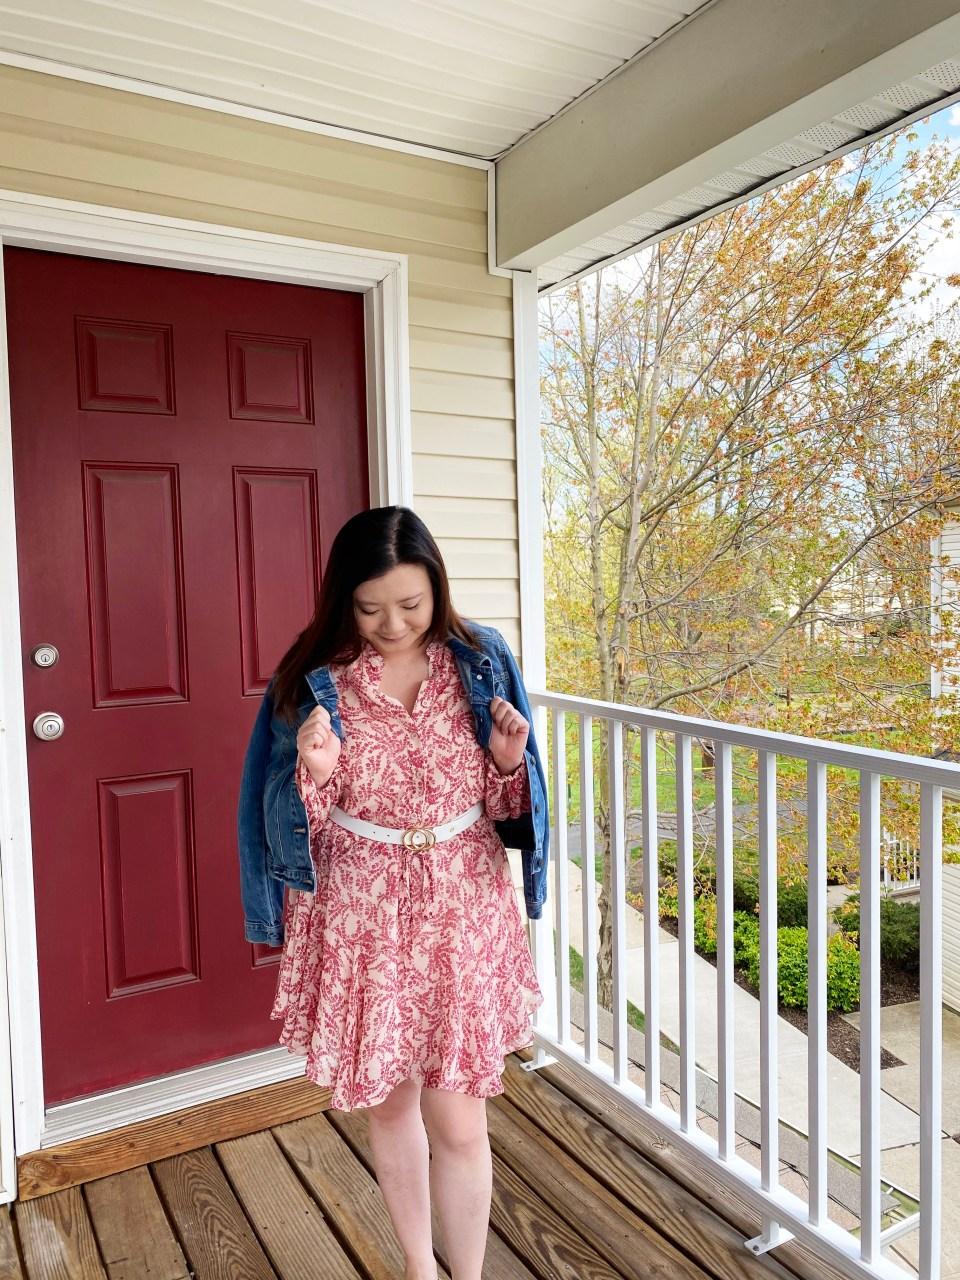 Grapevine Dress + Denim Jacket 7